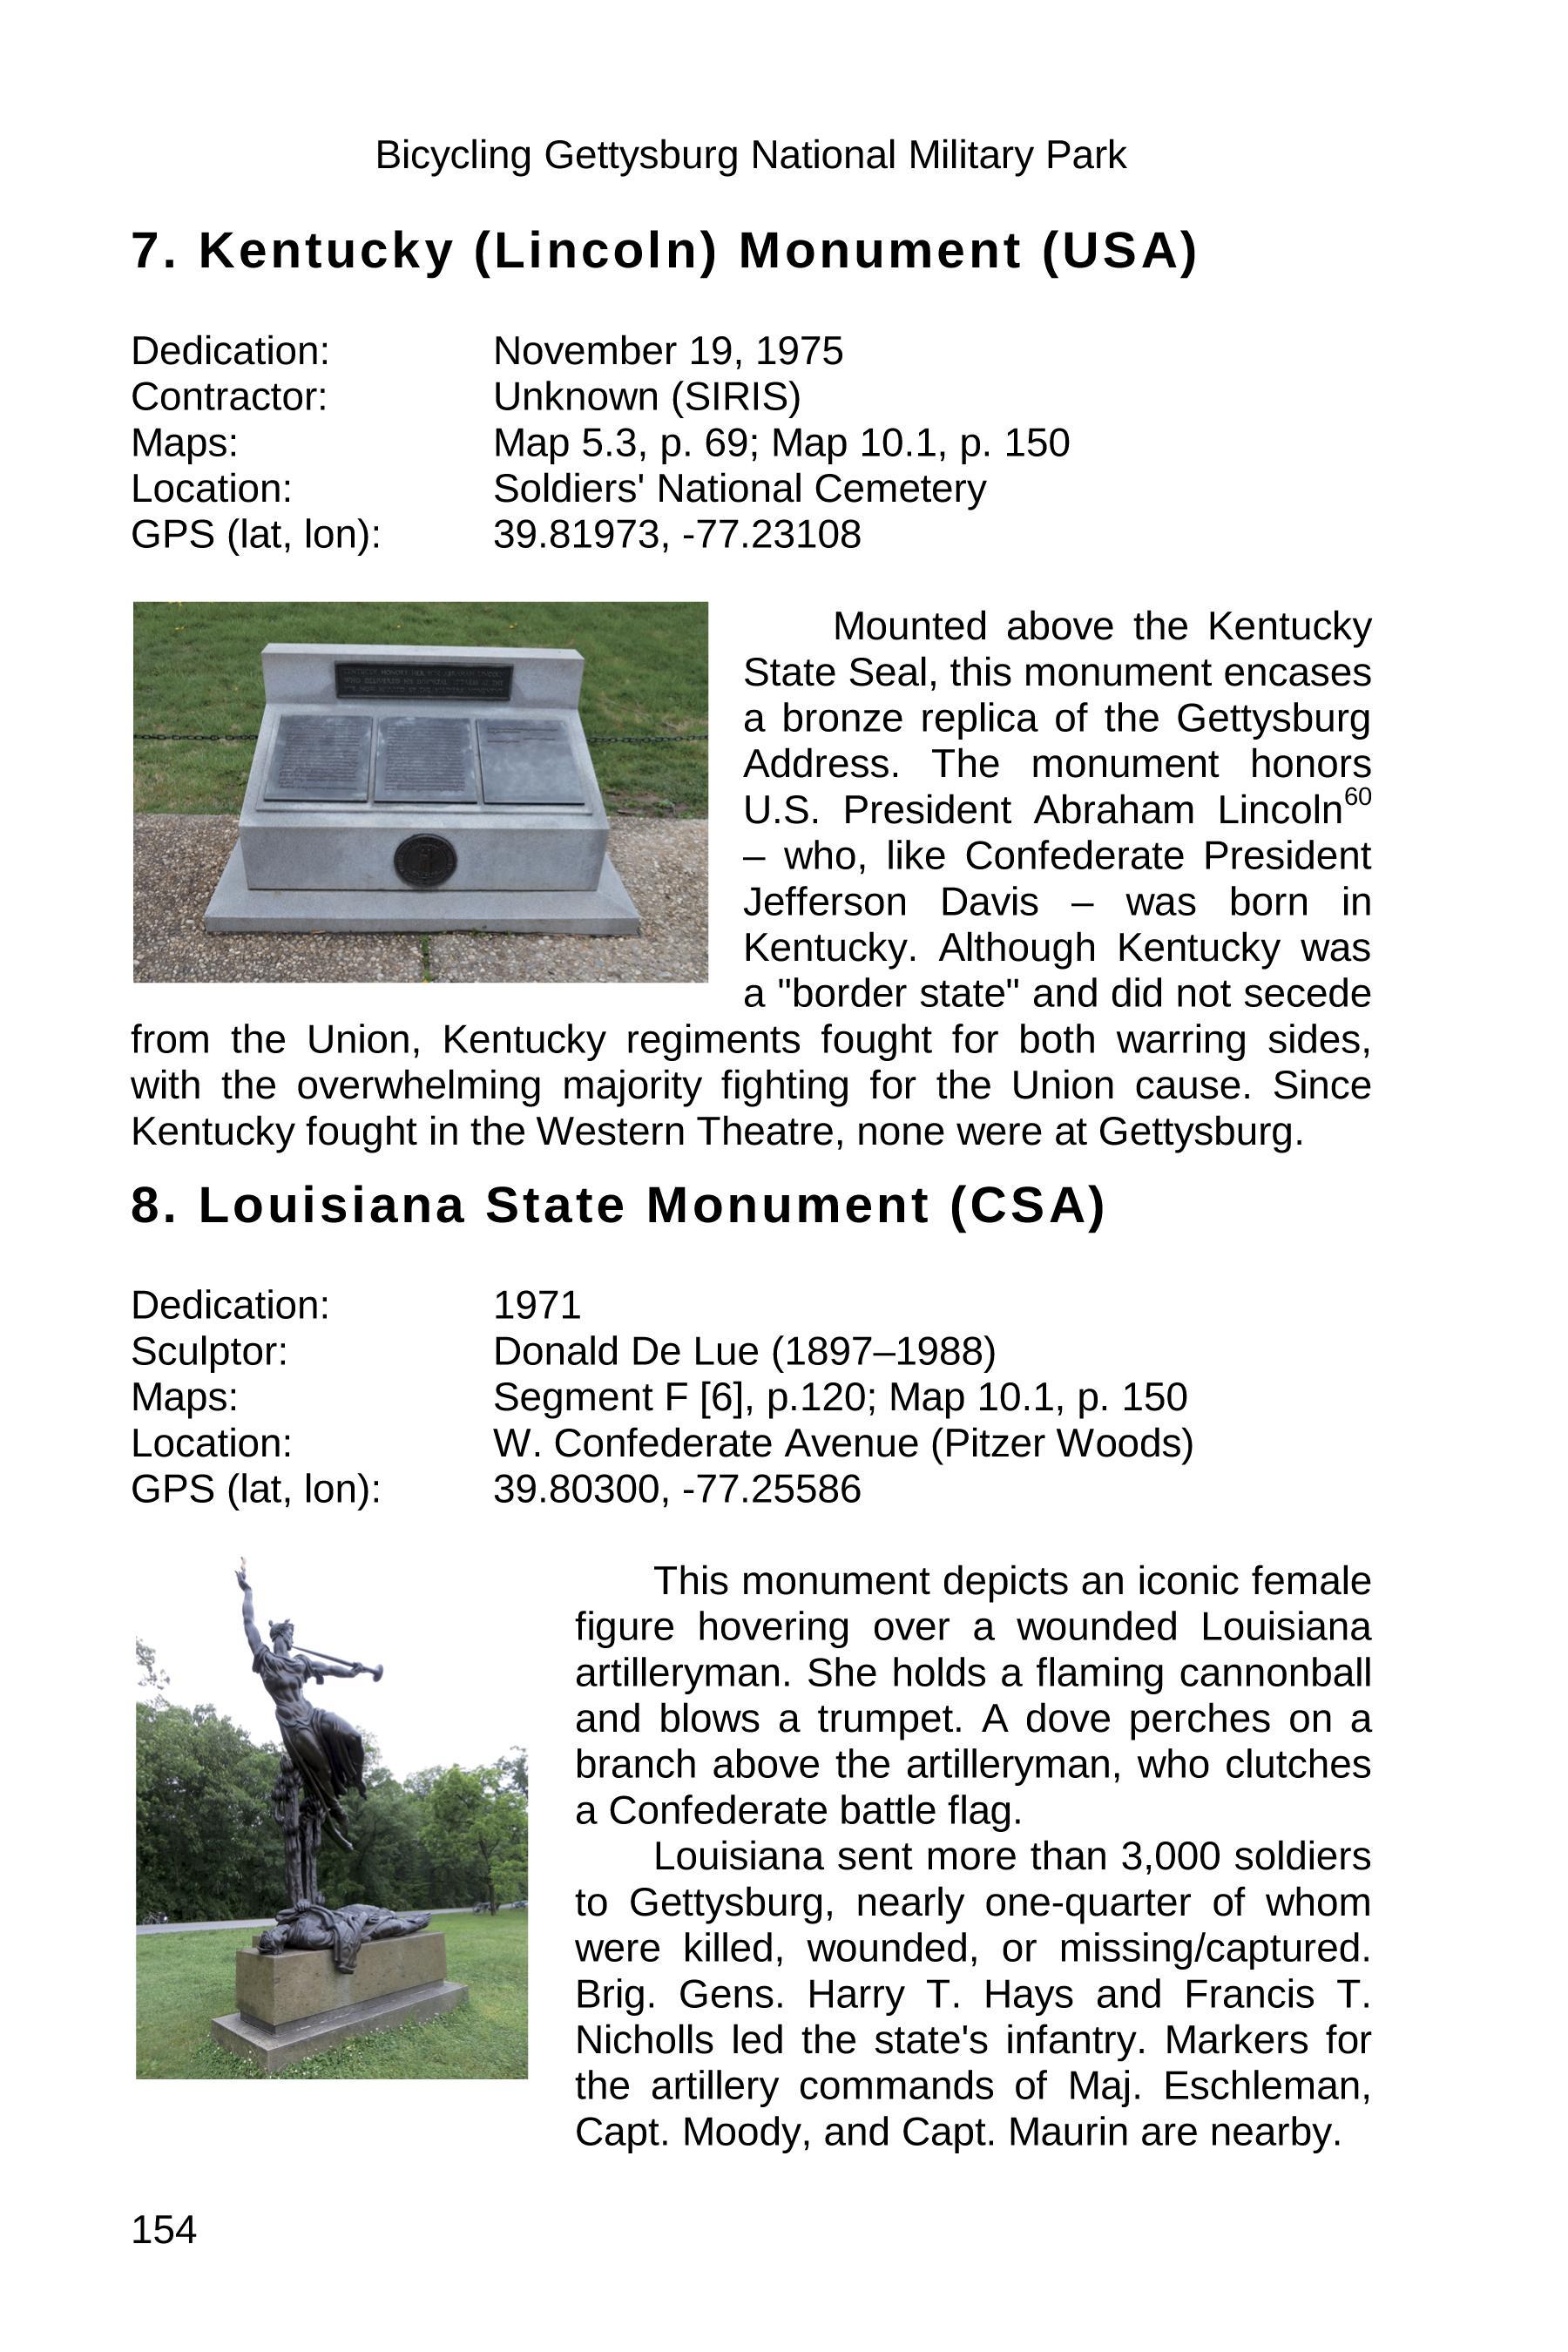 gettysburg state monuments sample 154